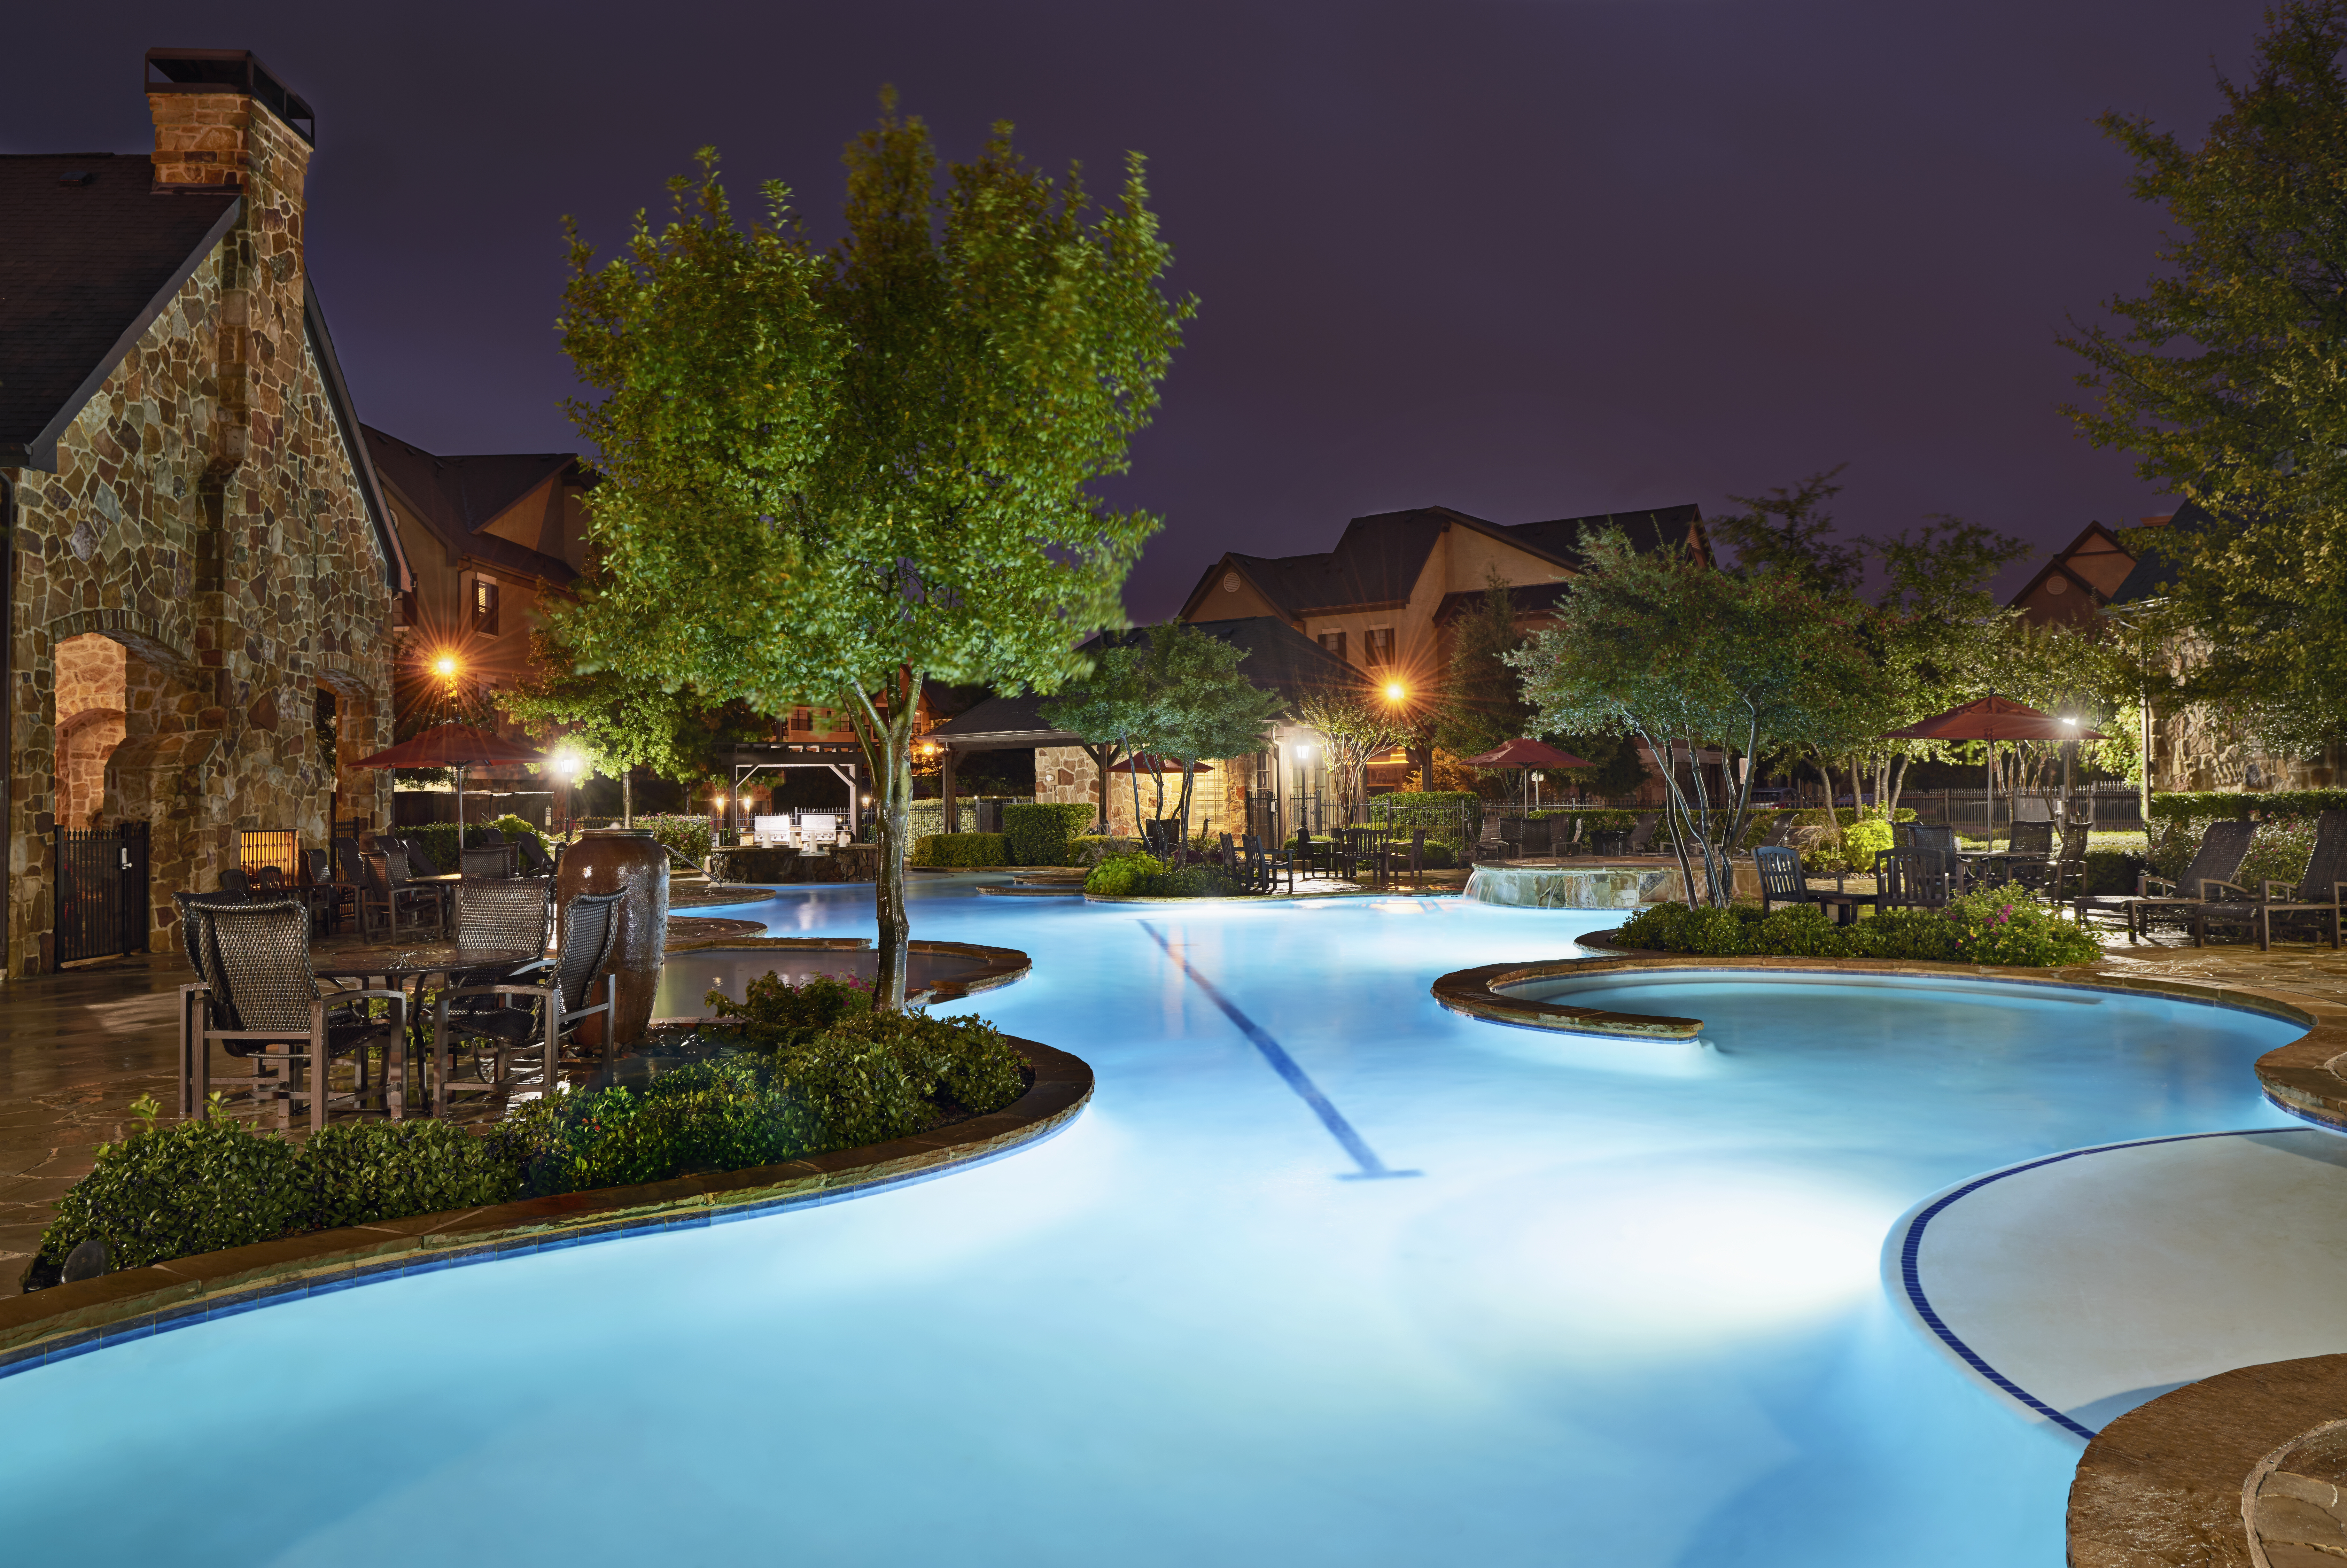 apartments for rent in grapevine, tx - camden riverwalk